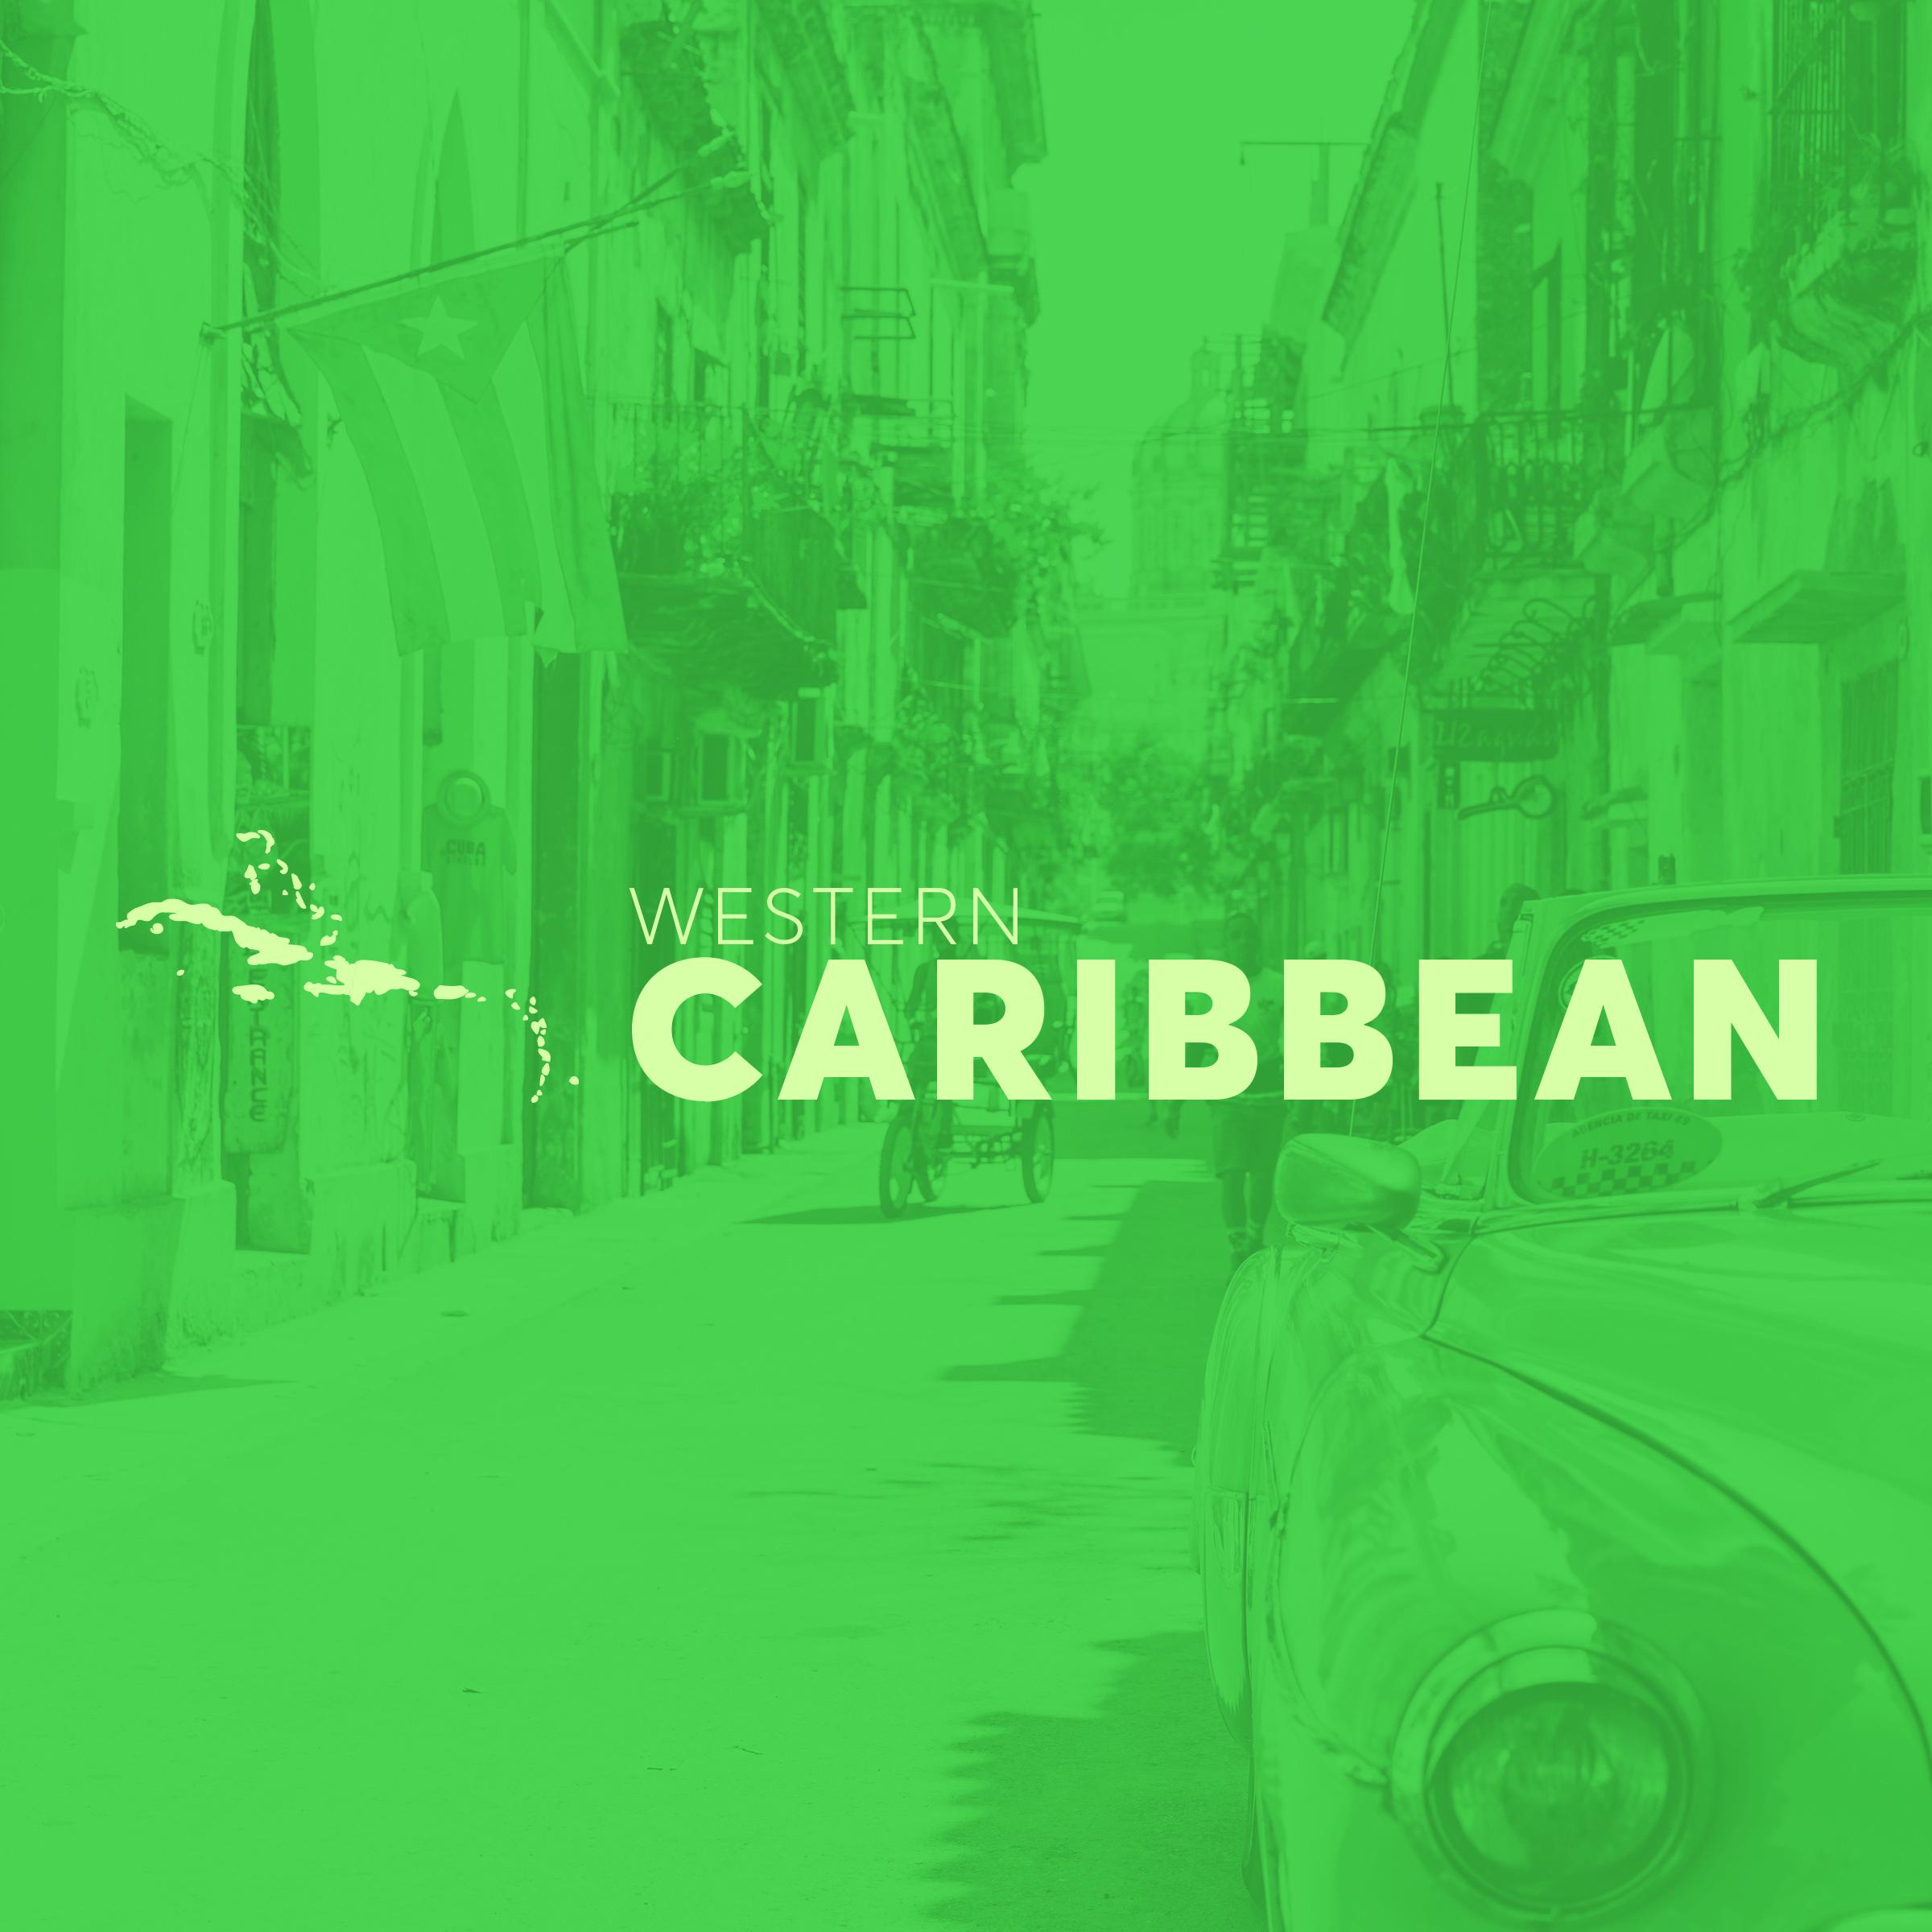 Caribbean 1080x1080.jpg